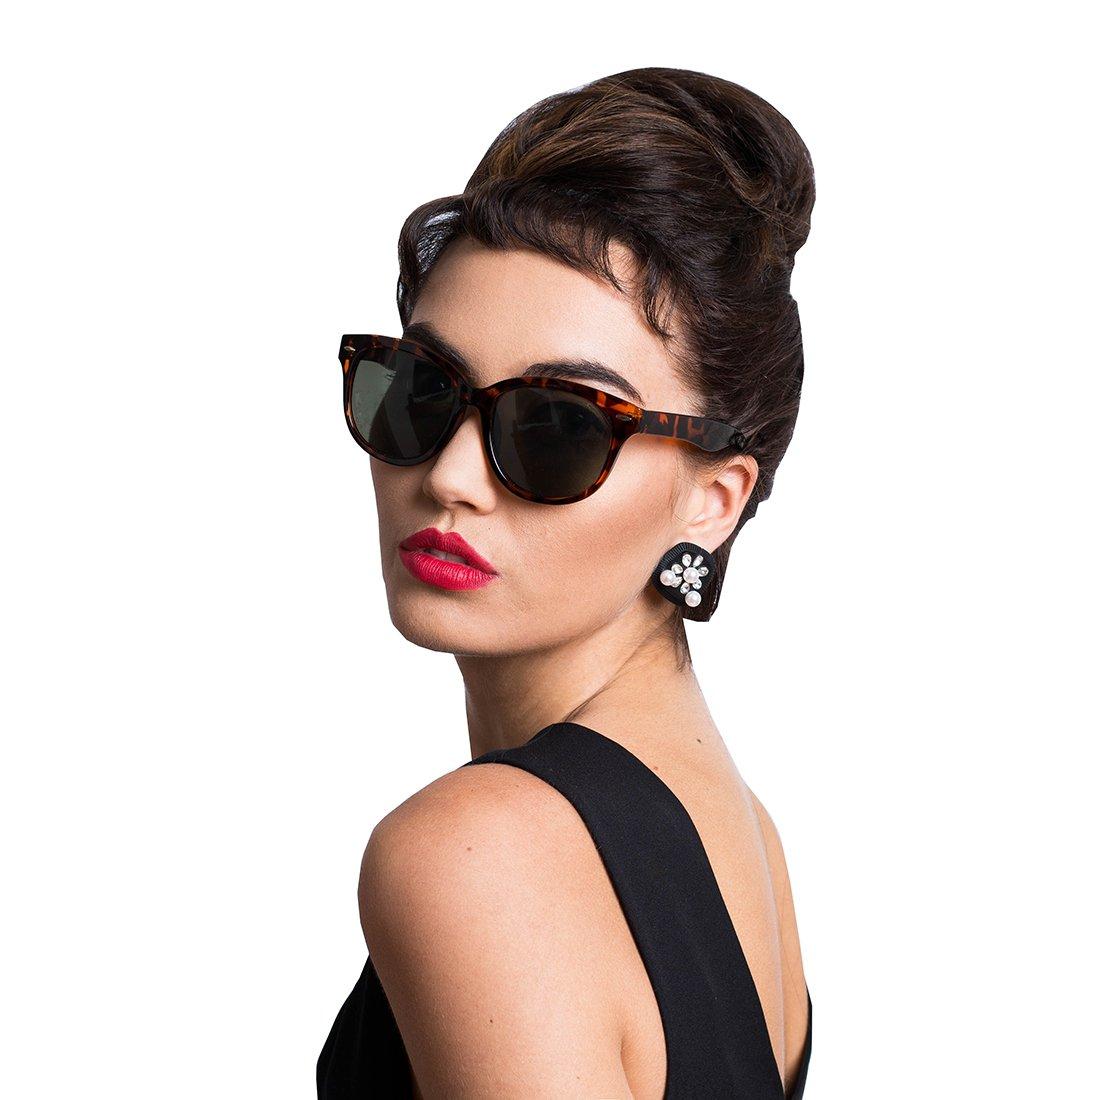 dcc19f95a0a2 Amazon.com  Audrey Hepburn Breakfast at Tiffany s Cat-Eyed Sunglasses  Vintage Retro Costume Tortoiseshell  Clothing